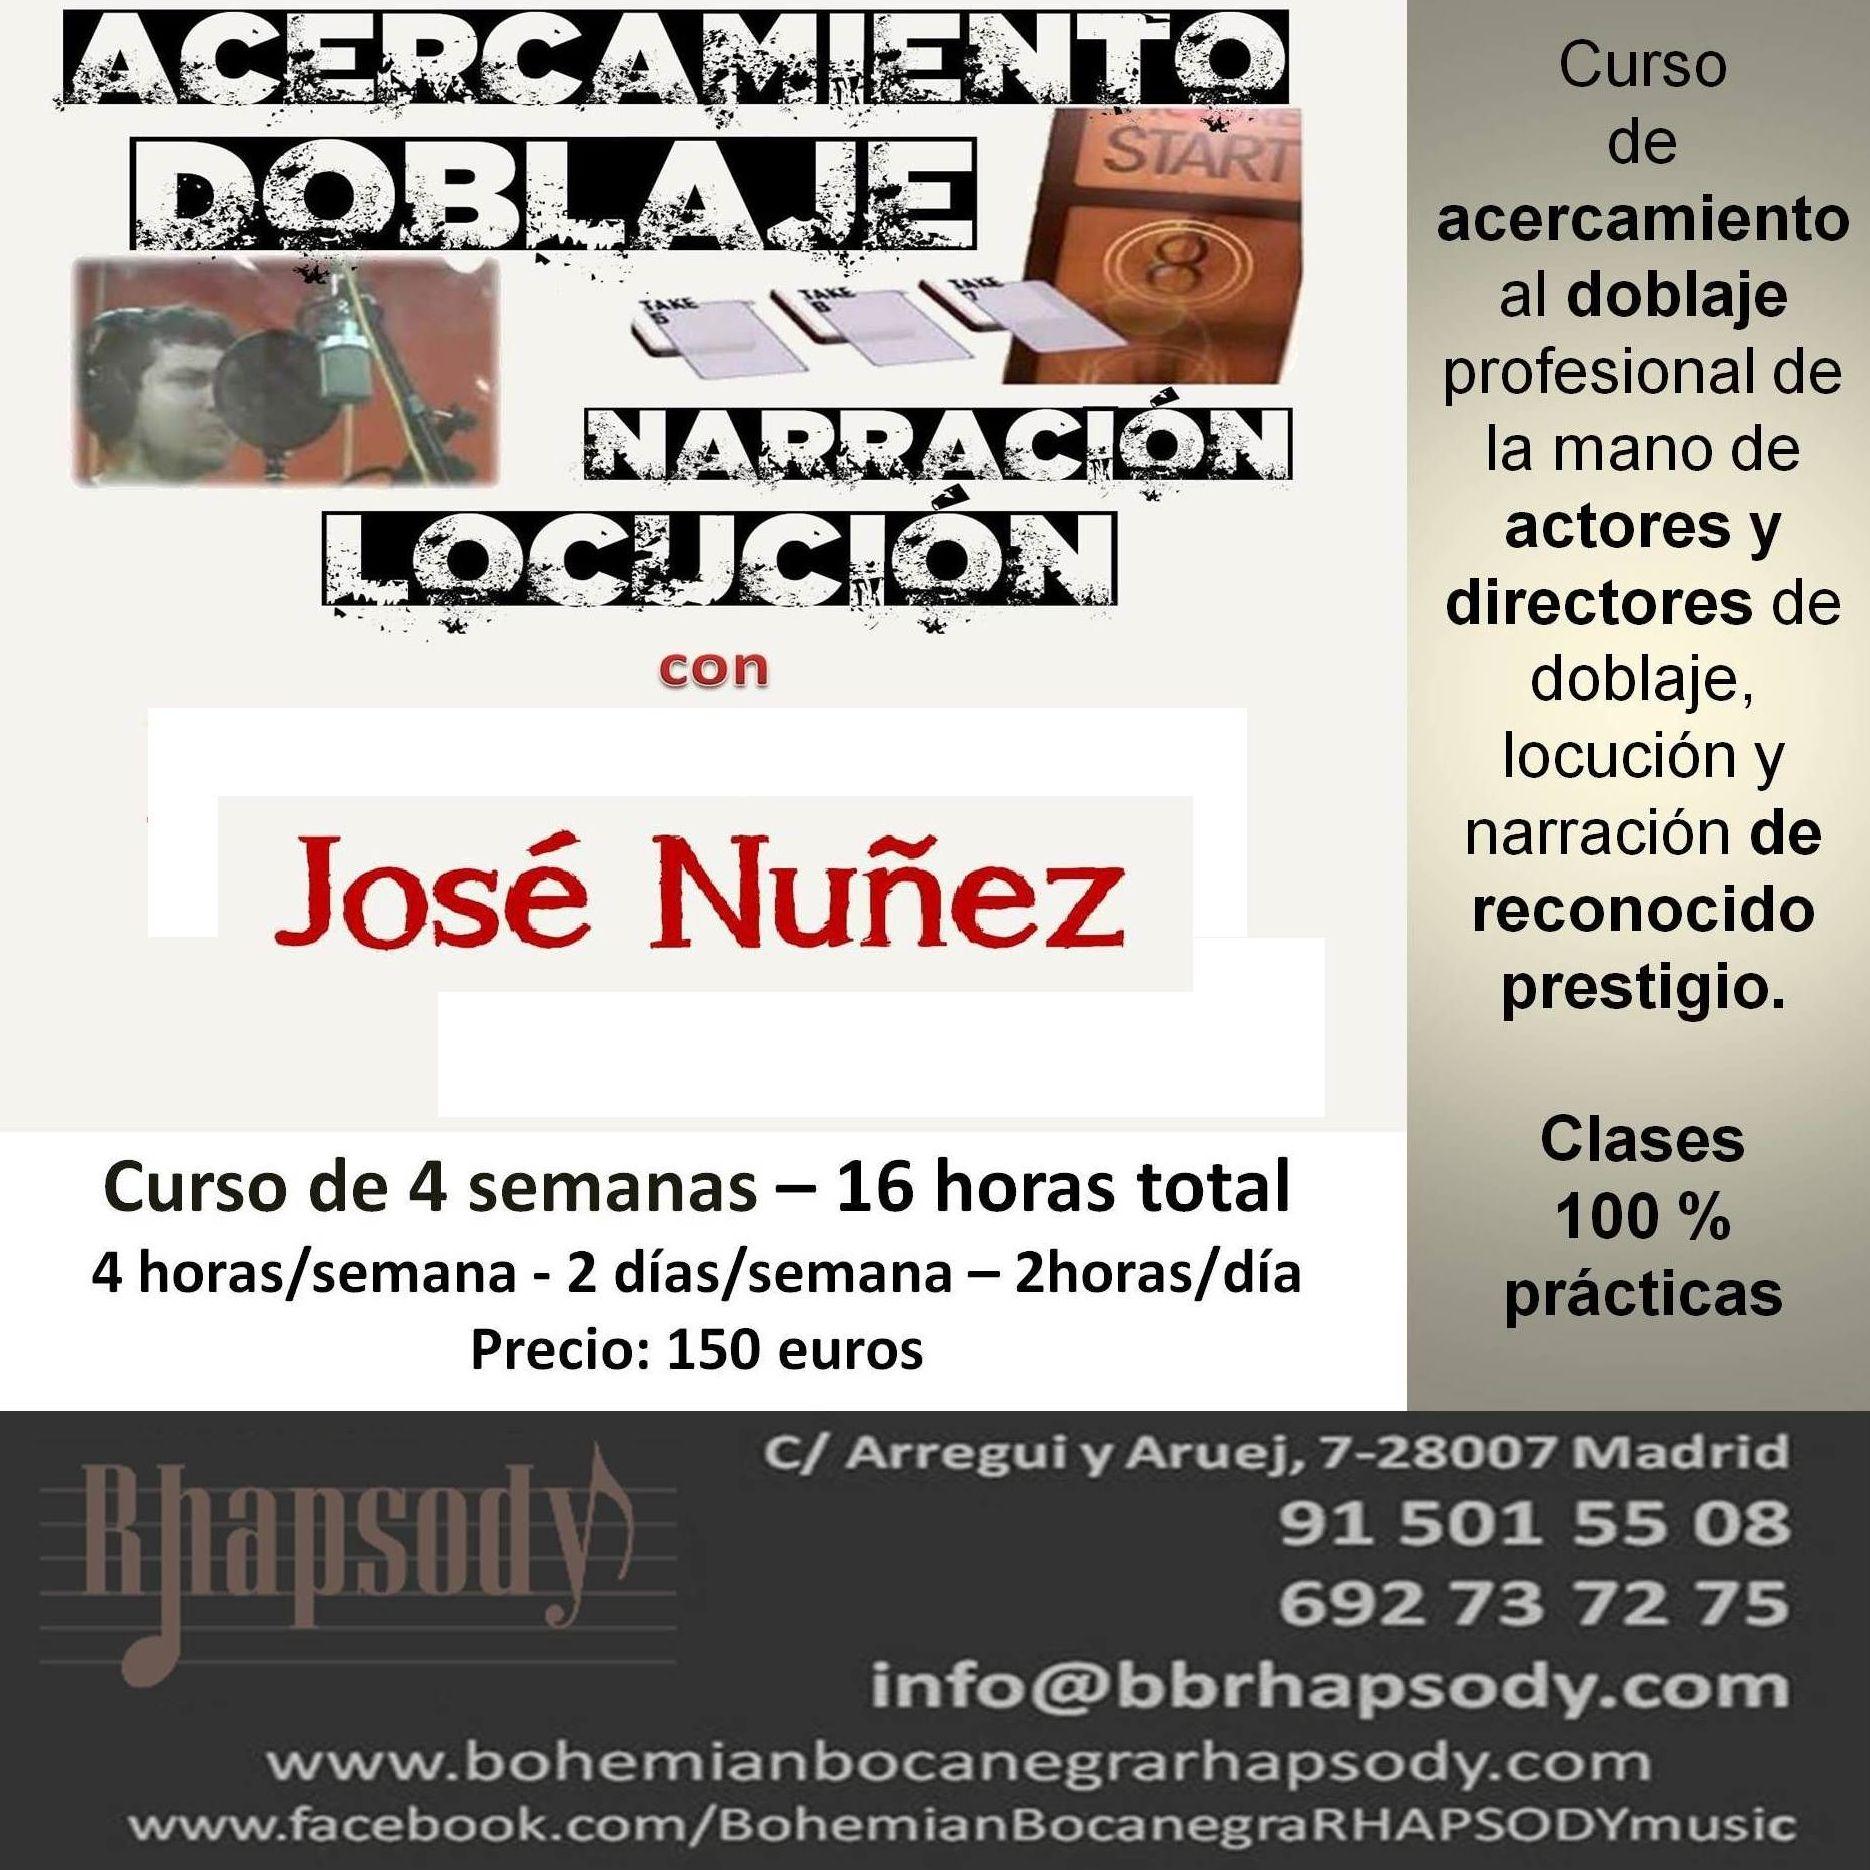 CURSO INTENSIVO DE DOBLAJE Y LOCUCIÓN: Catálogo formación de Bohemian Bocanegra Rhapsody Music